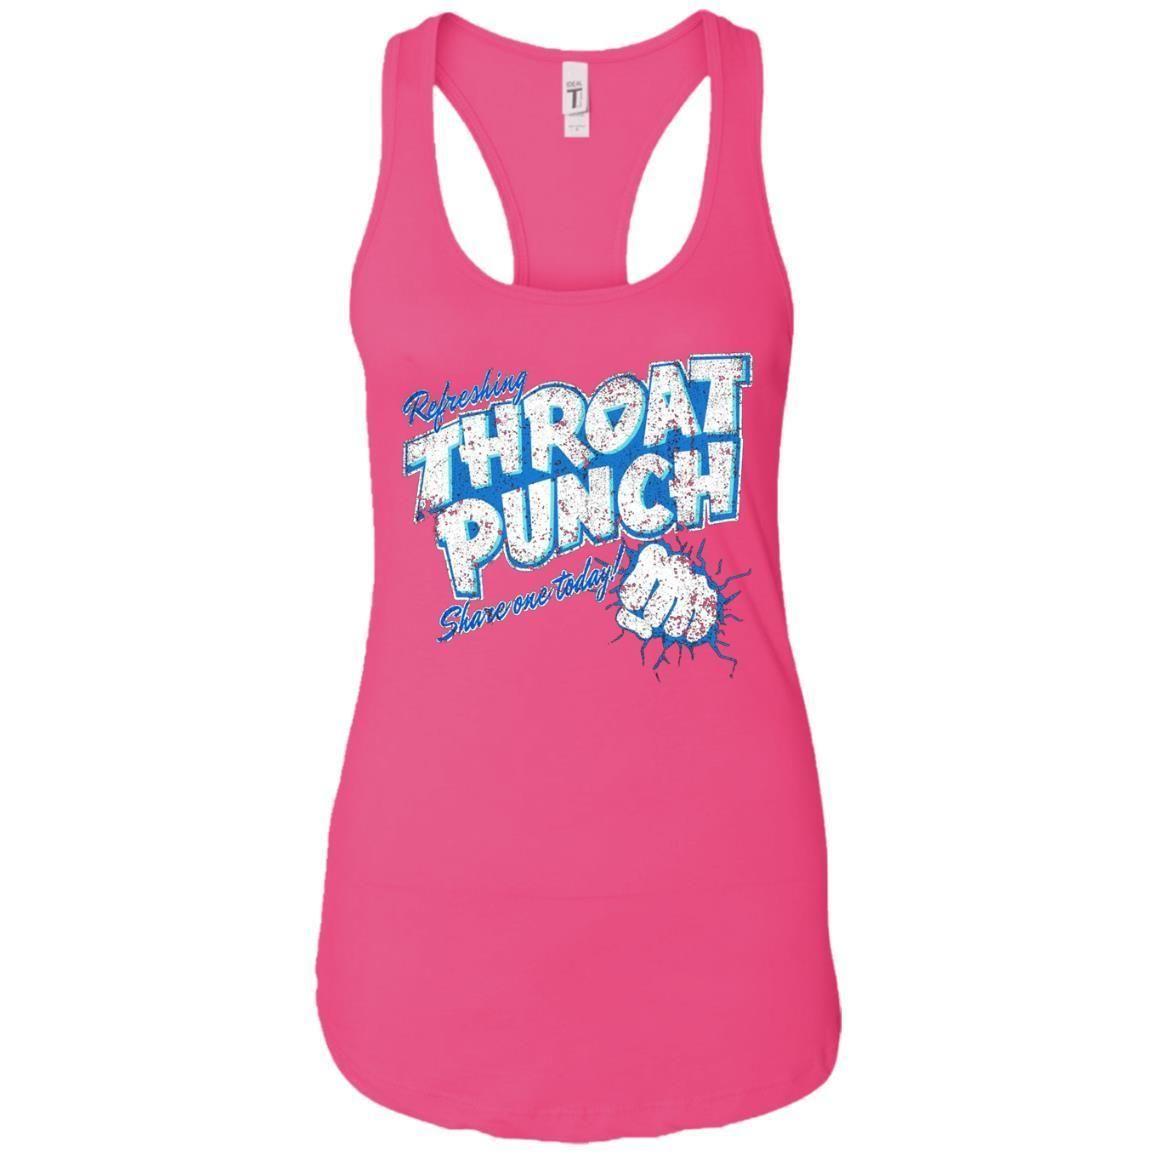 Refreshing Throat Punch Grunge Ladies Ideal Racerback Tank Day T Shirt Tank Top Fashion Racerback Tank Athletic Tank Tops